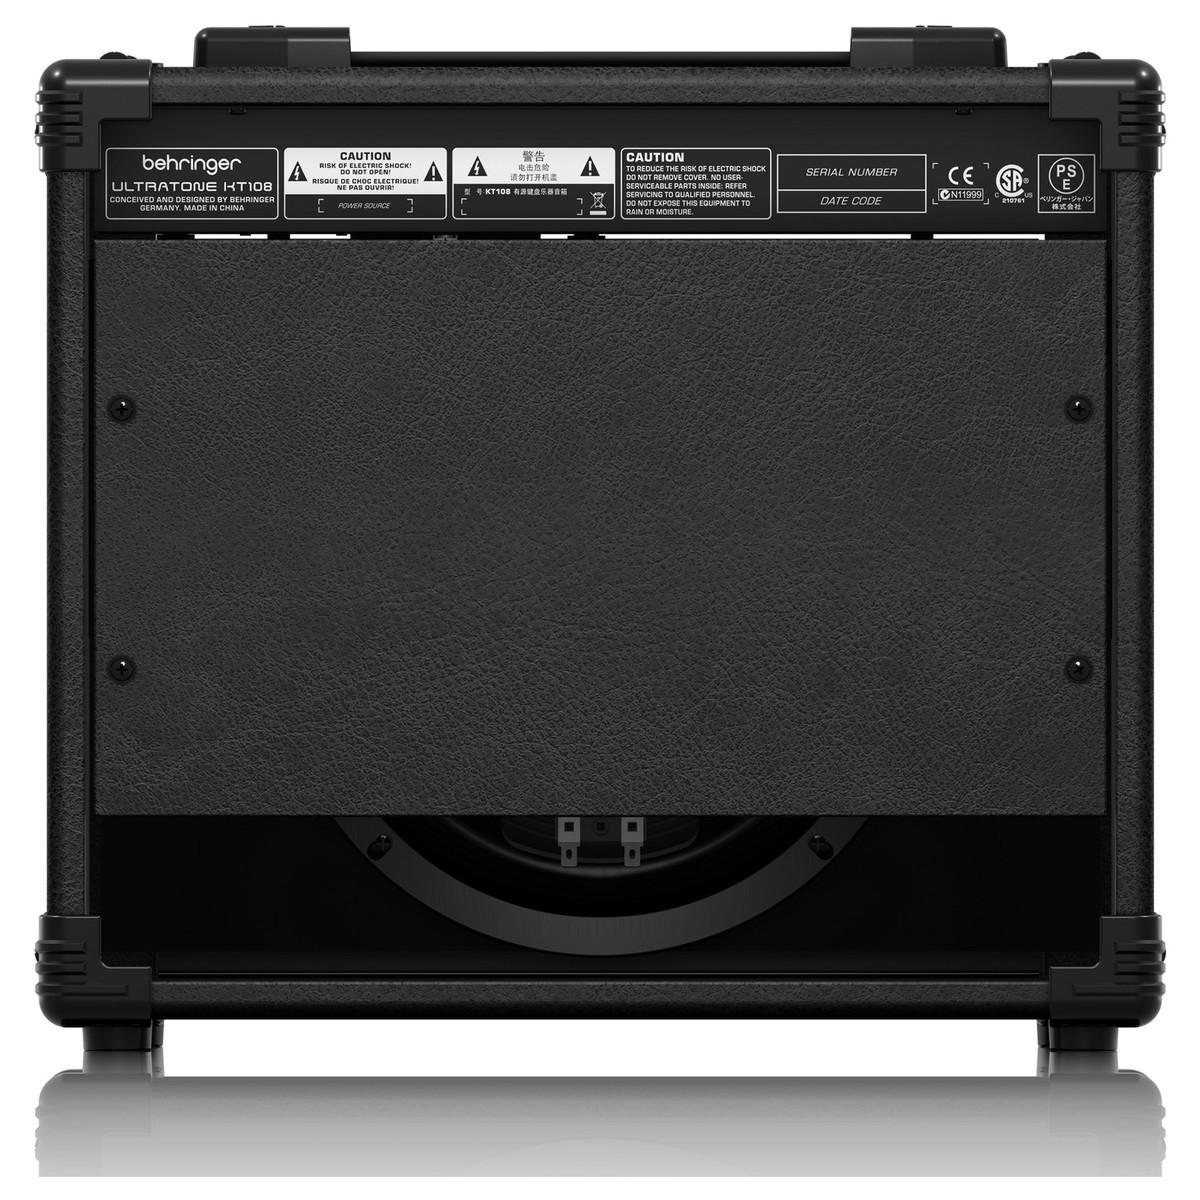 behringer kt108 ultra compact 15 watt keyboard amp b stock at gear4music. Black Bedroom Furniture Sets. Home Design Ideas